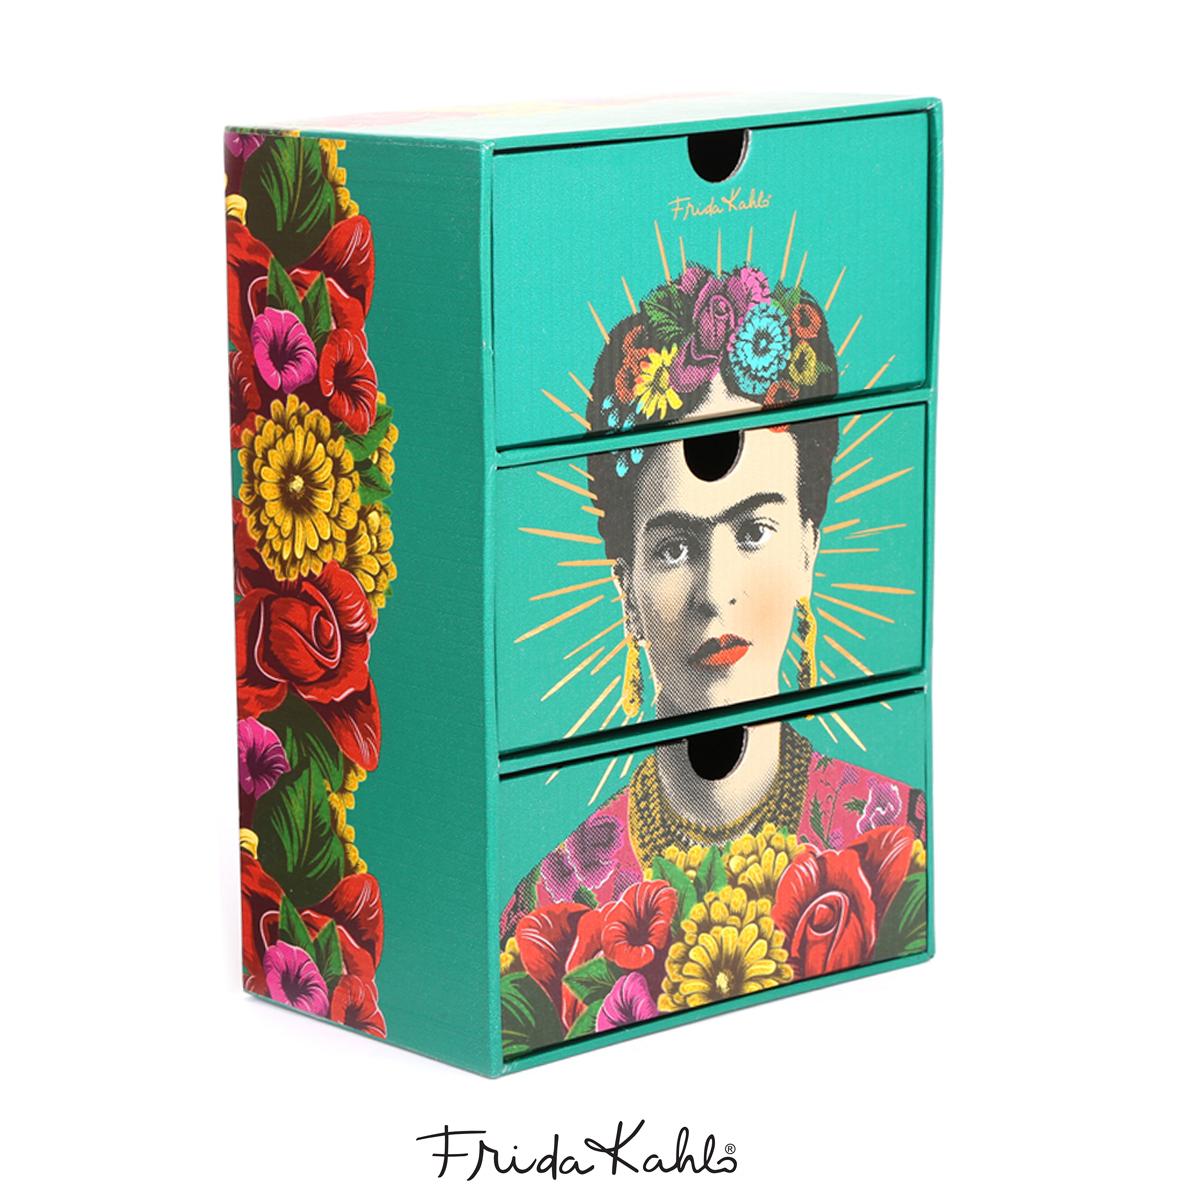 Boite de rangement / bijoux \'Frida Kahlo\' vert - 22x15x10 cm - [A0604]